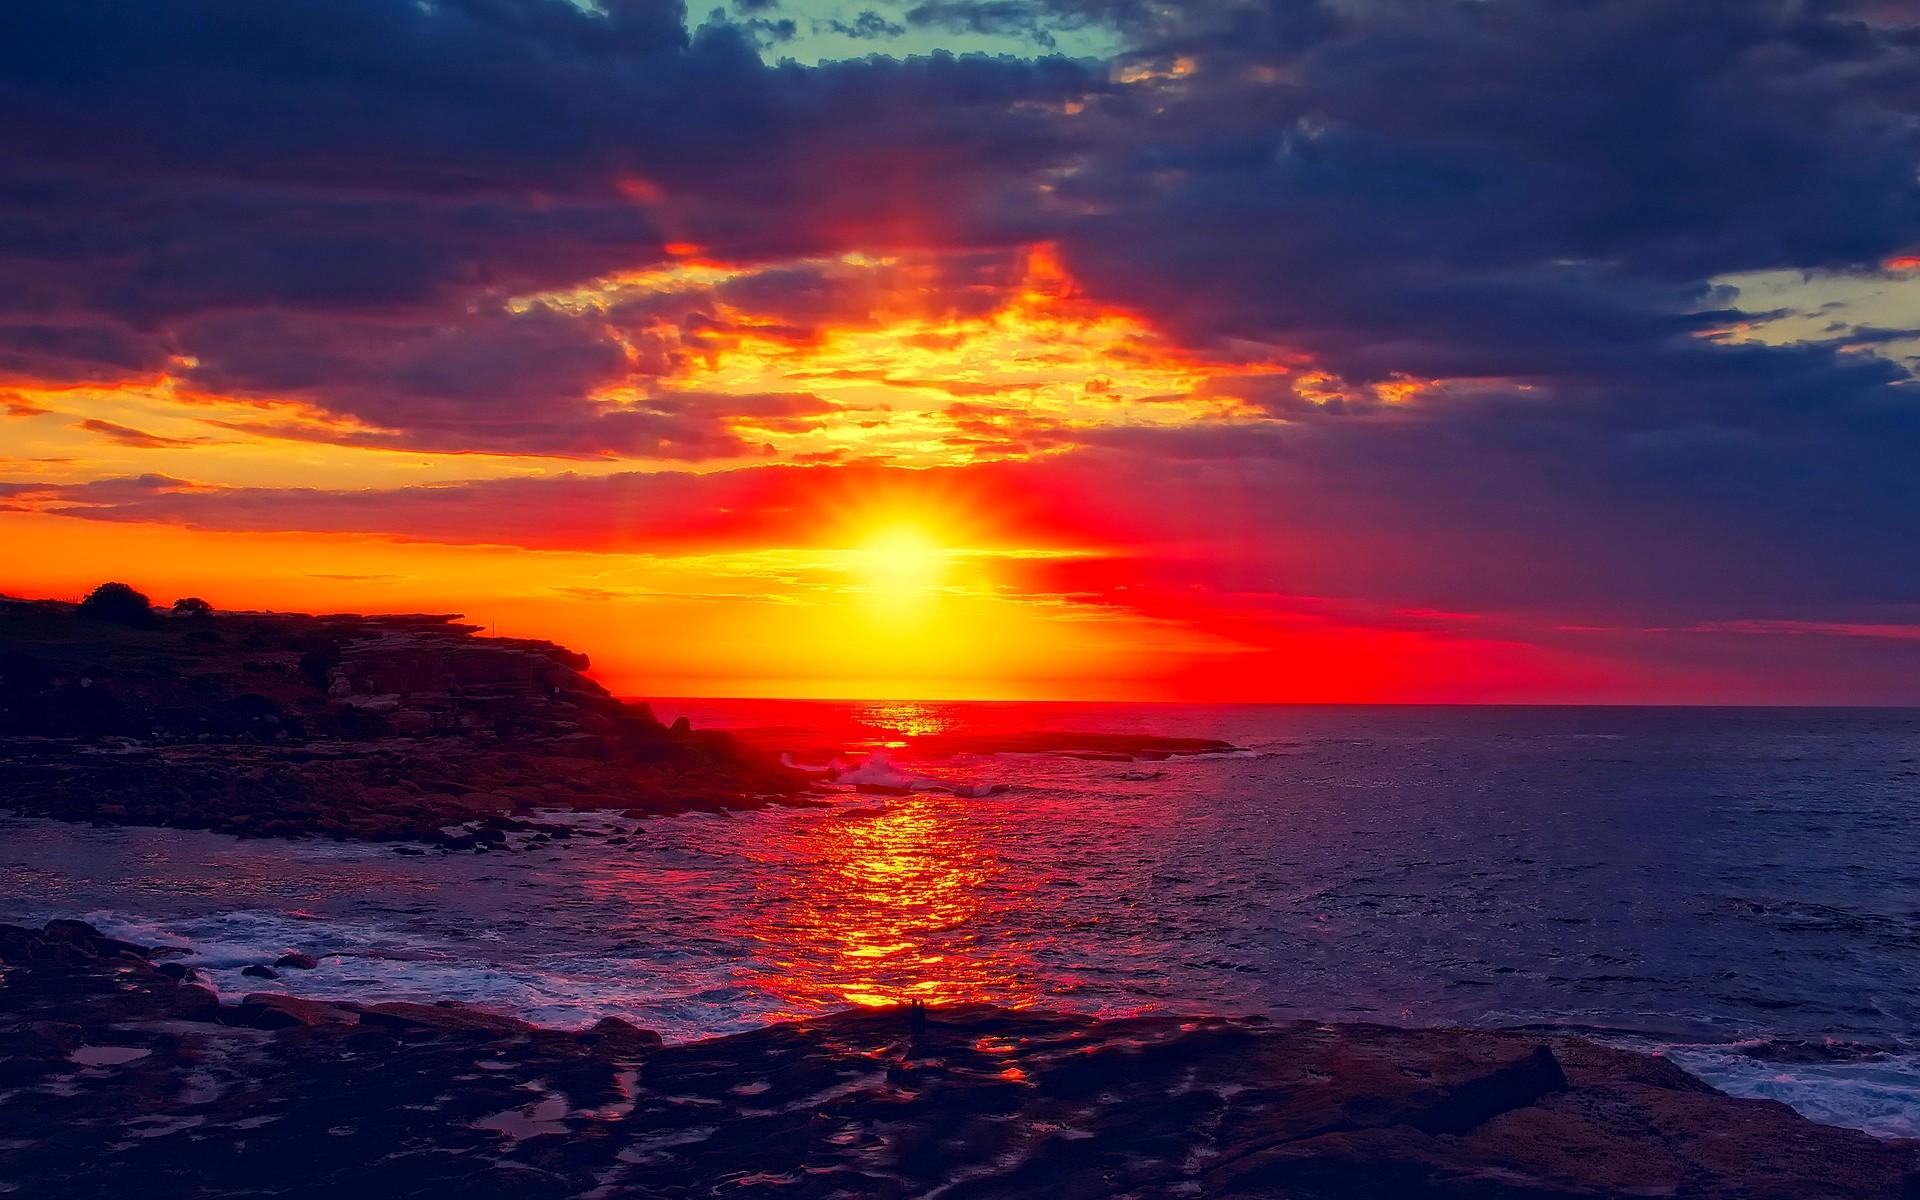 Summer Sunset Wallpaper (63+ images)